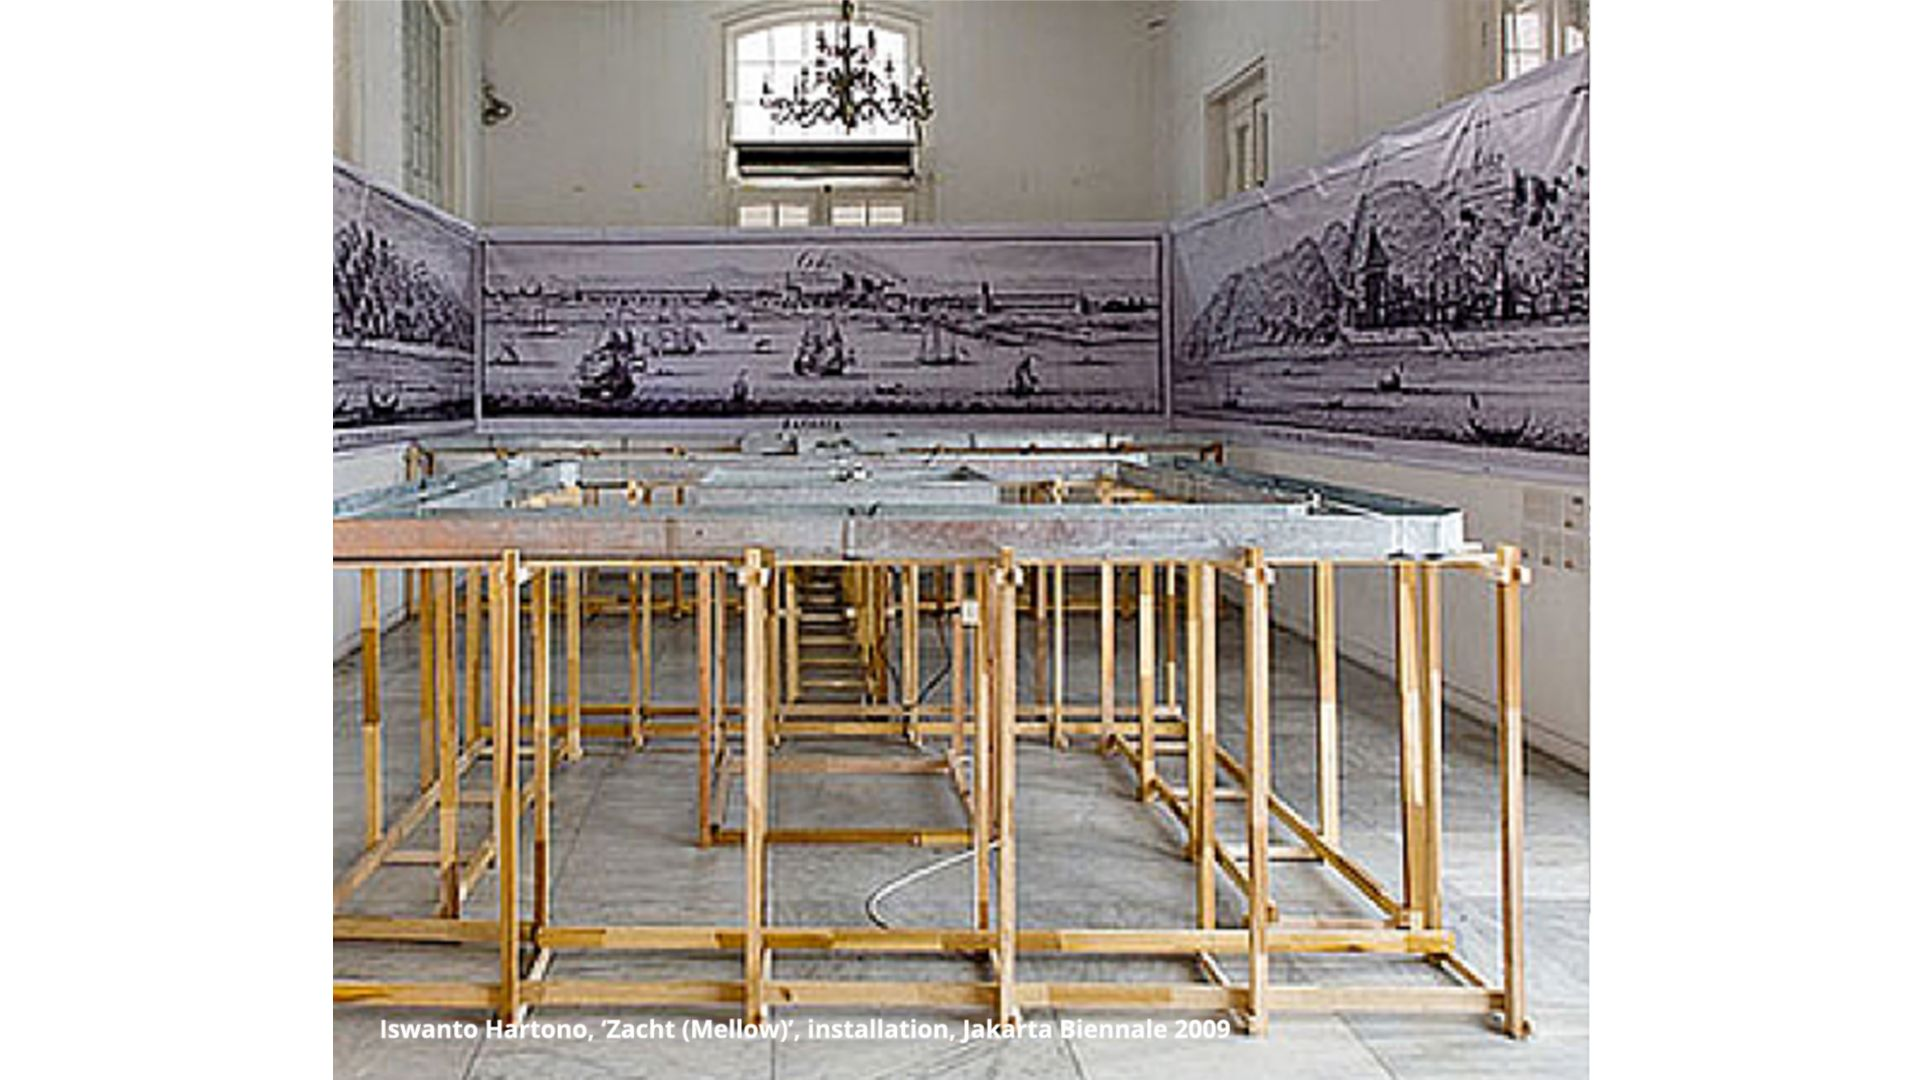 Iswanto Hartono, 'Zacht (Mellow)', installation, Jakarta Biennale 2009-a